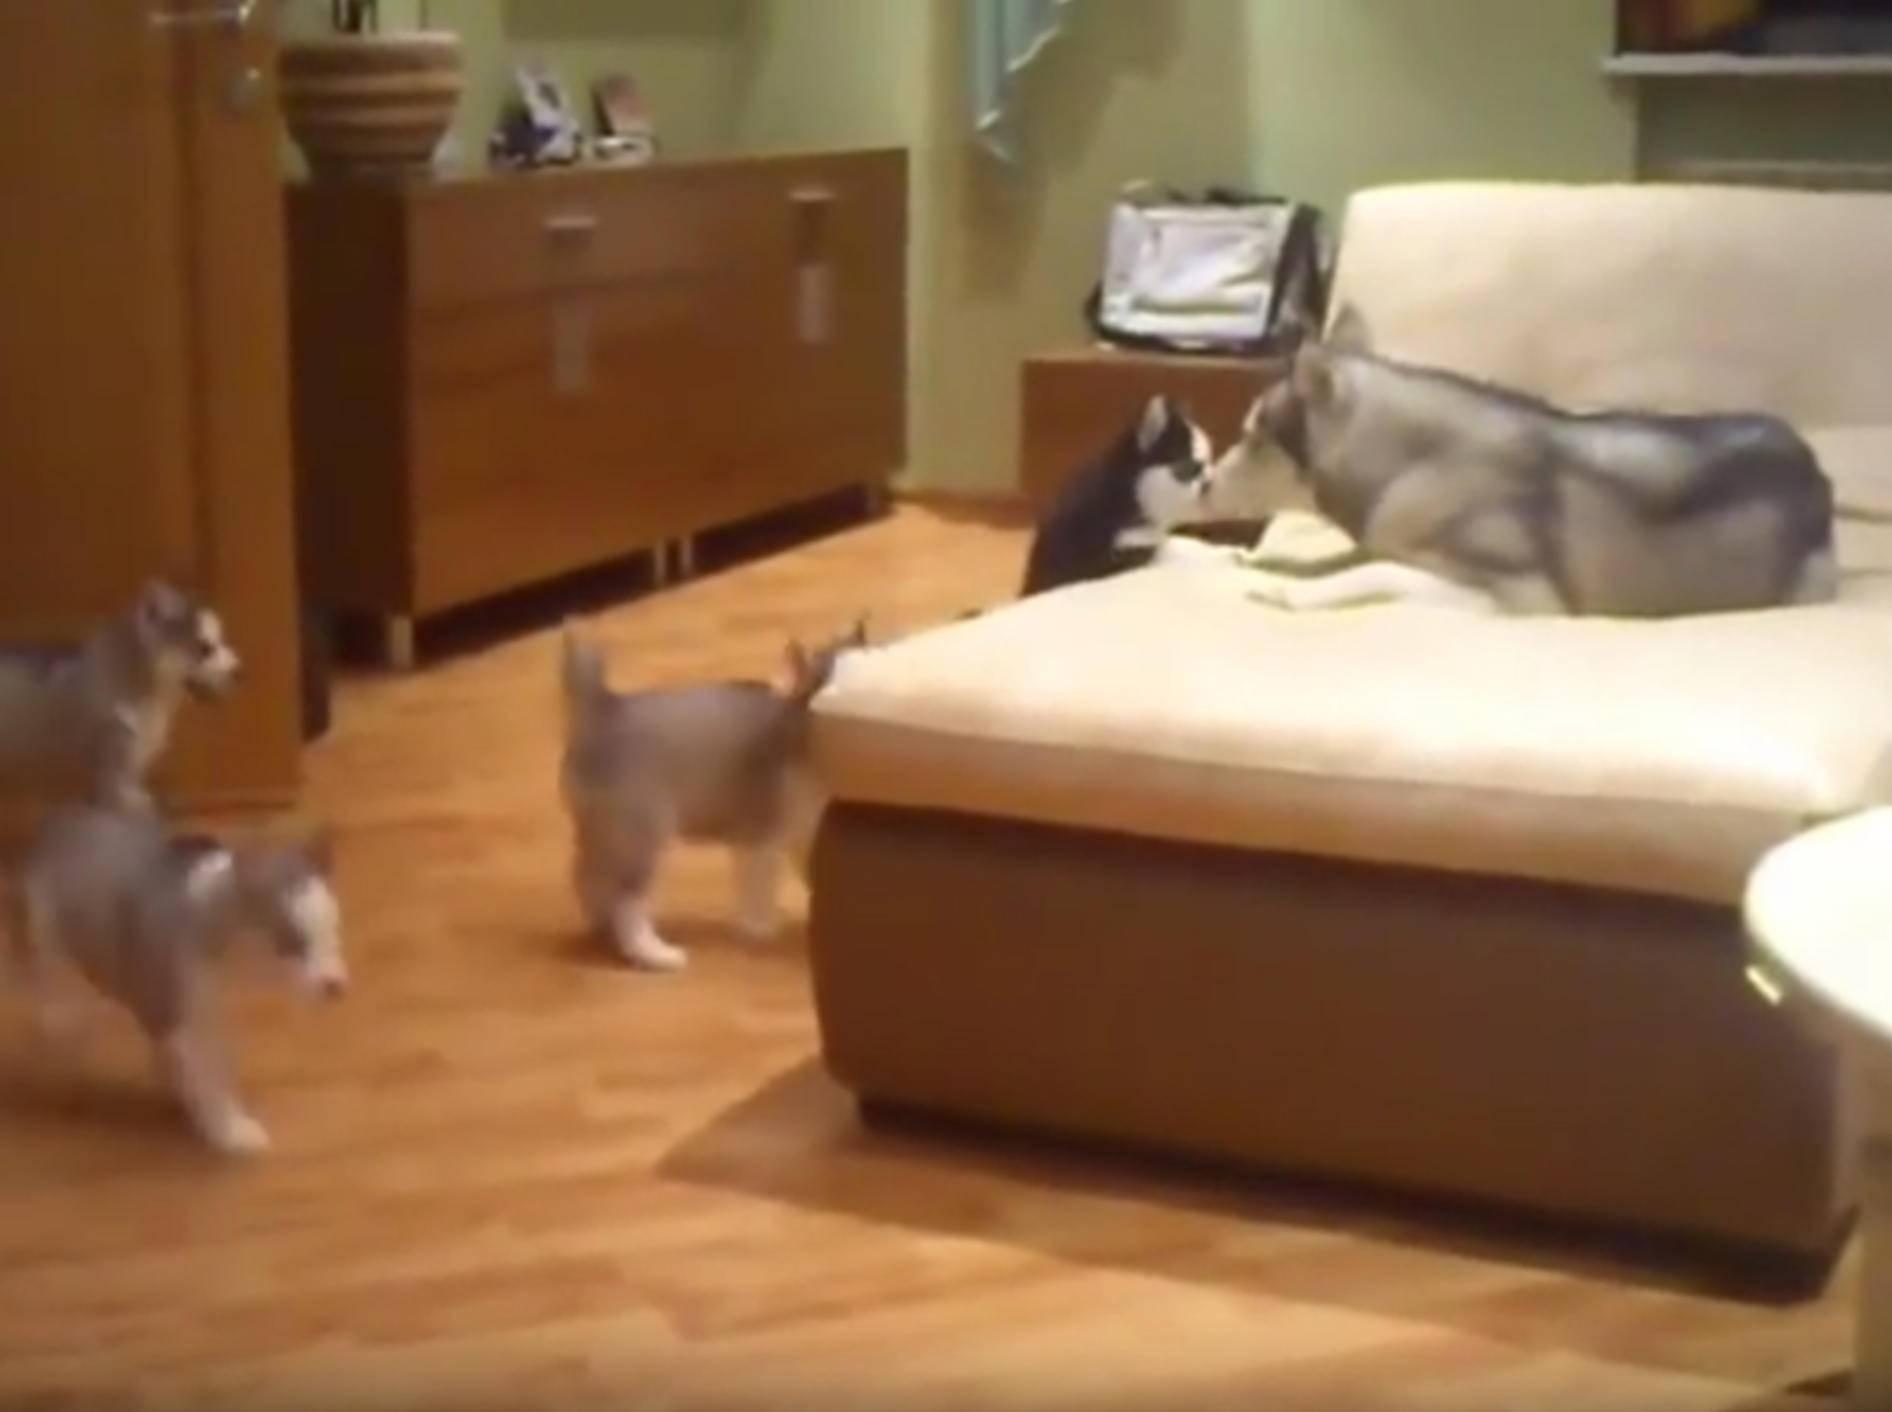 Zuckersüße Hundefamilie: Husky-Mama spielt mit Welpen – YouTube / assa op